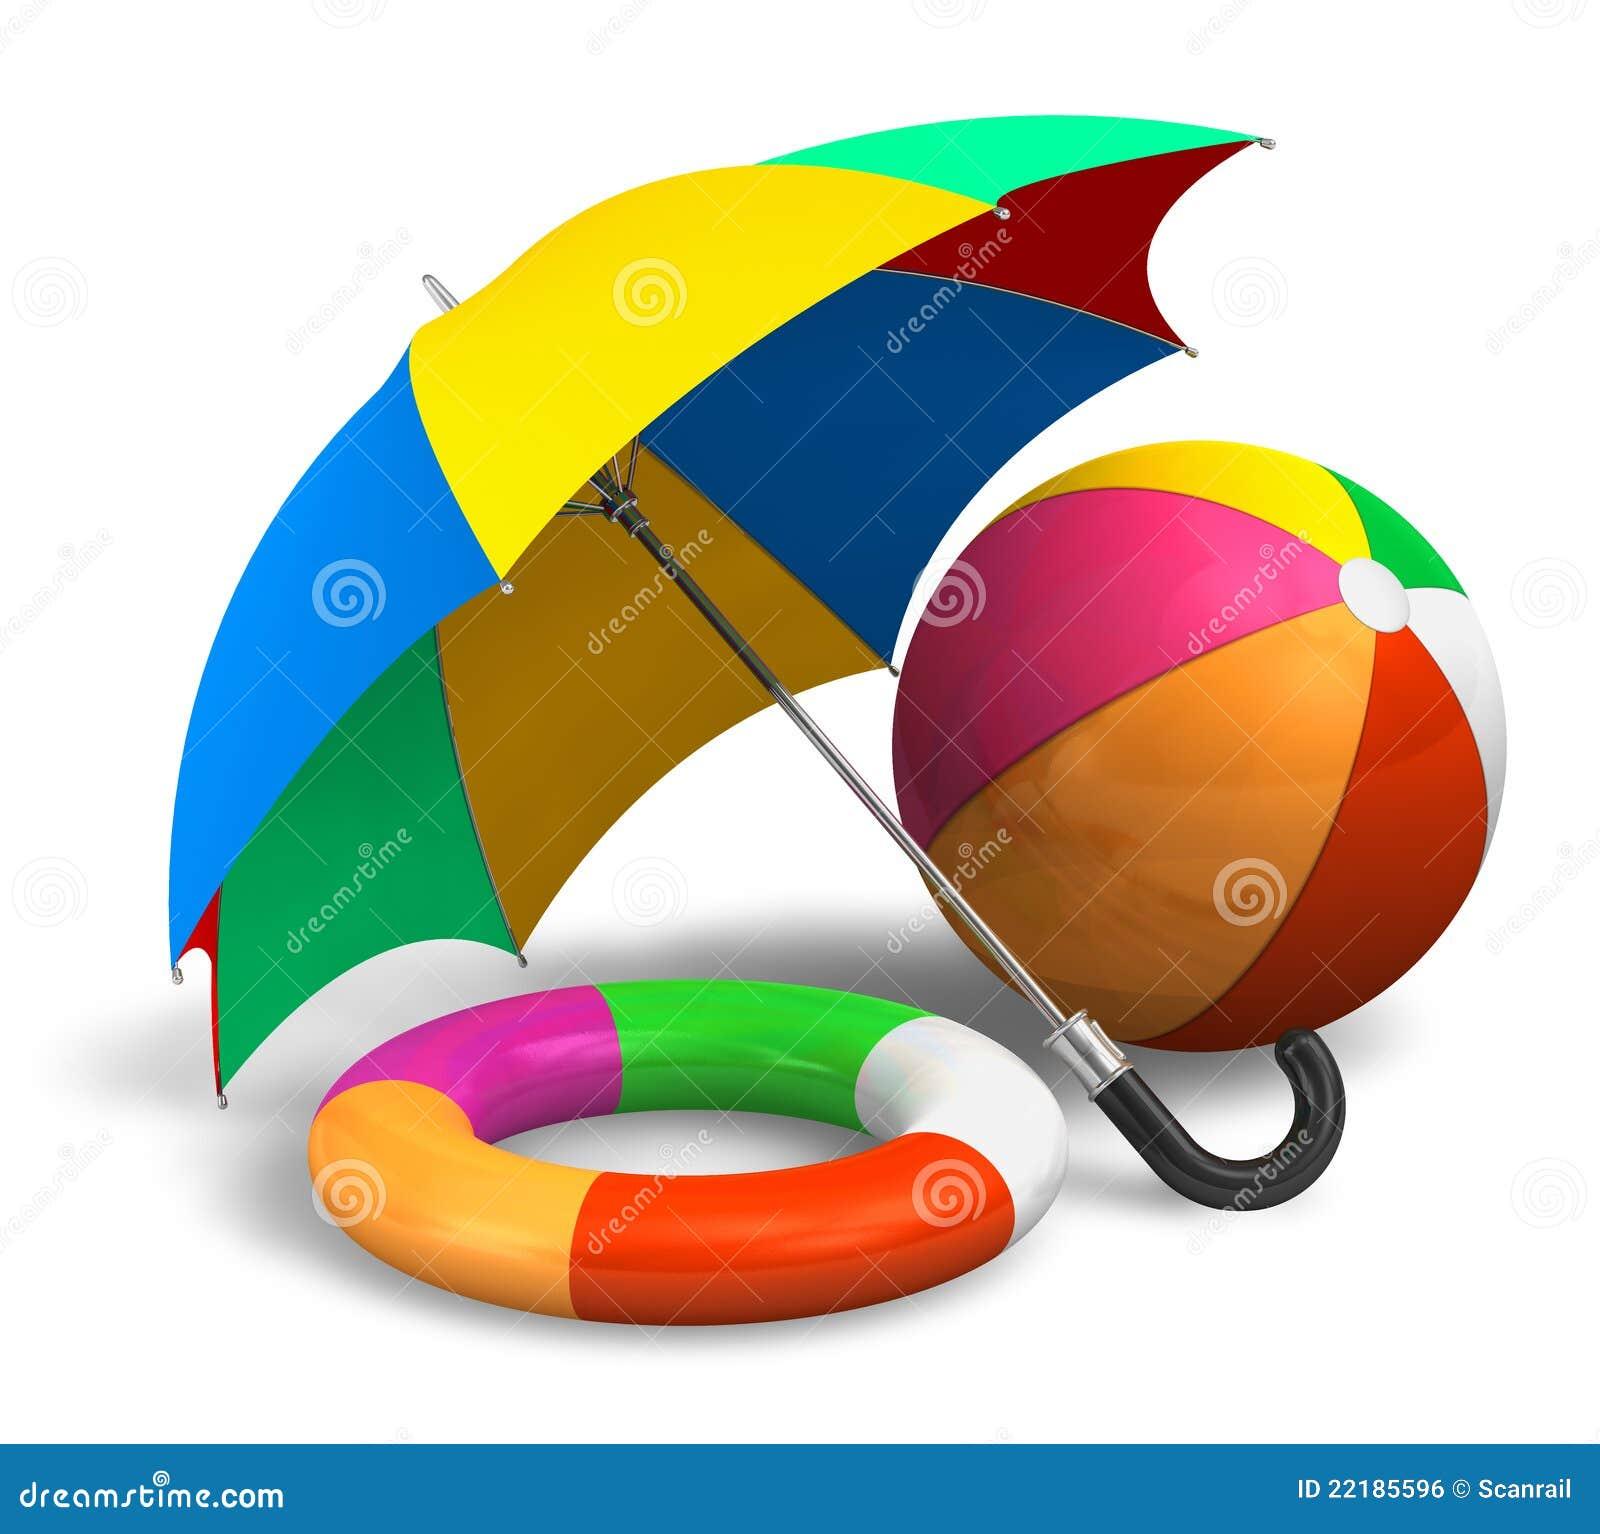 Beach Items: Color Umbrella, Ball And Lifesaver Stock